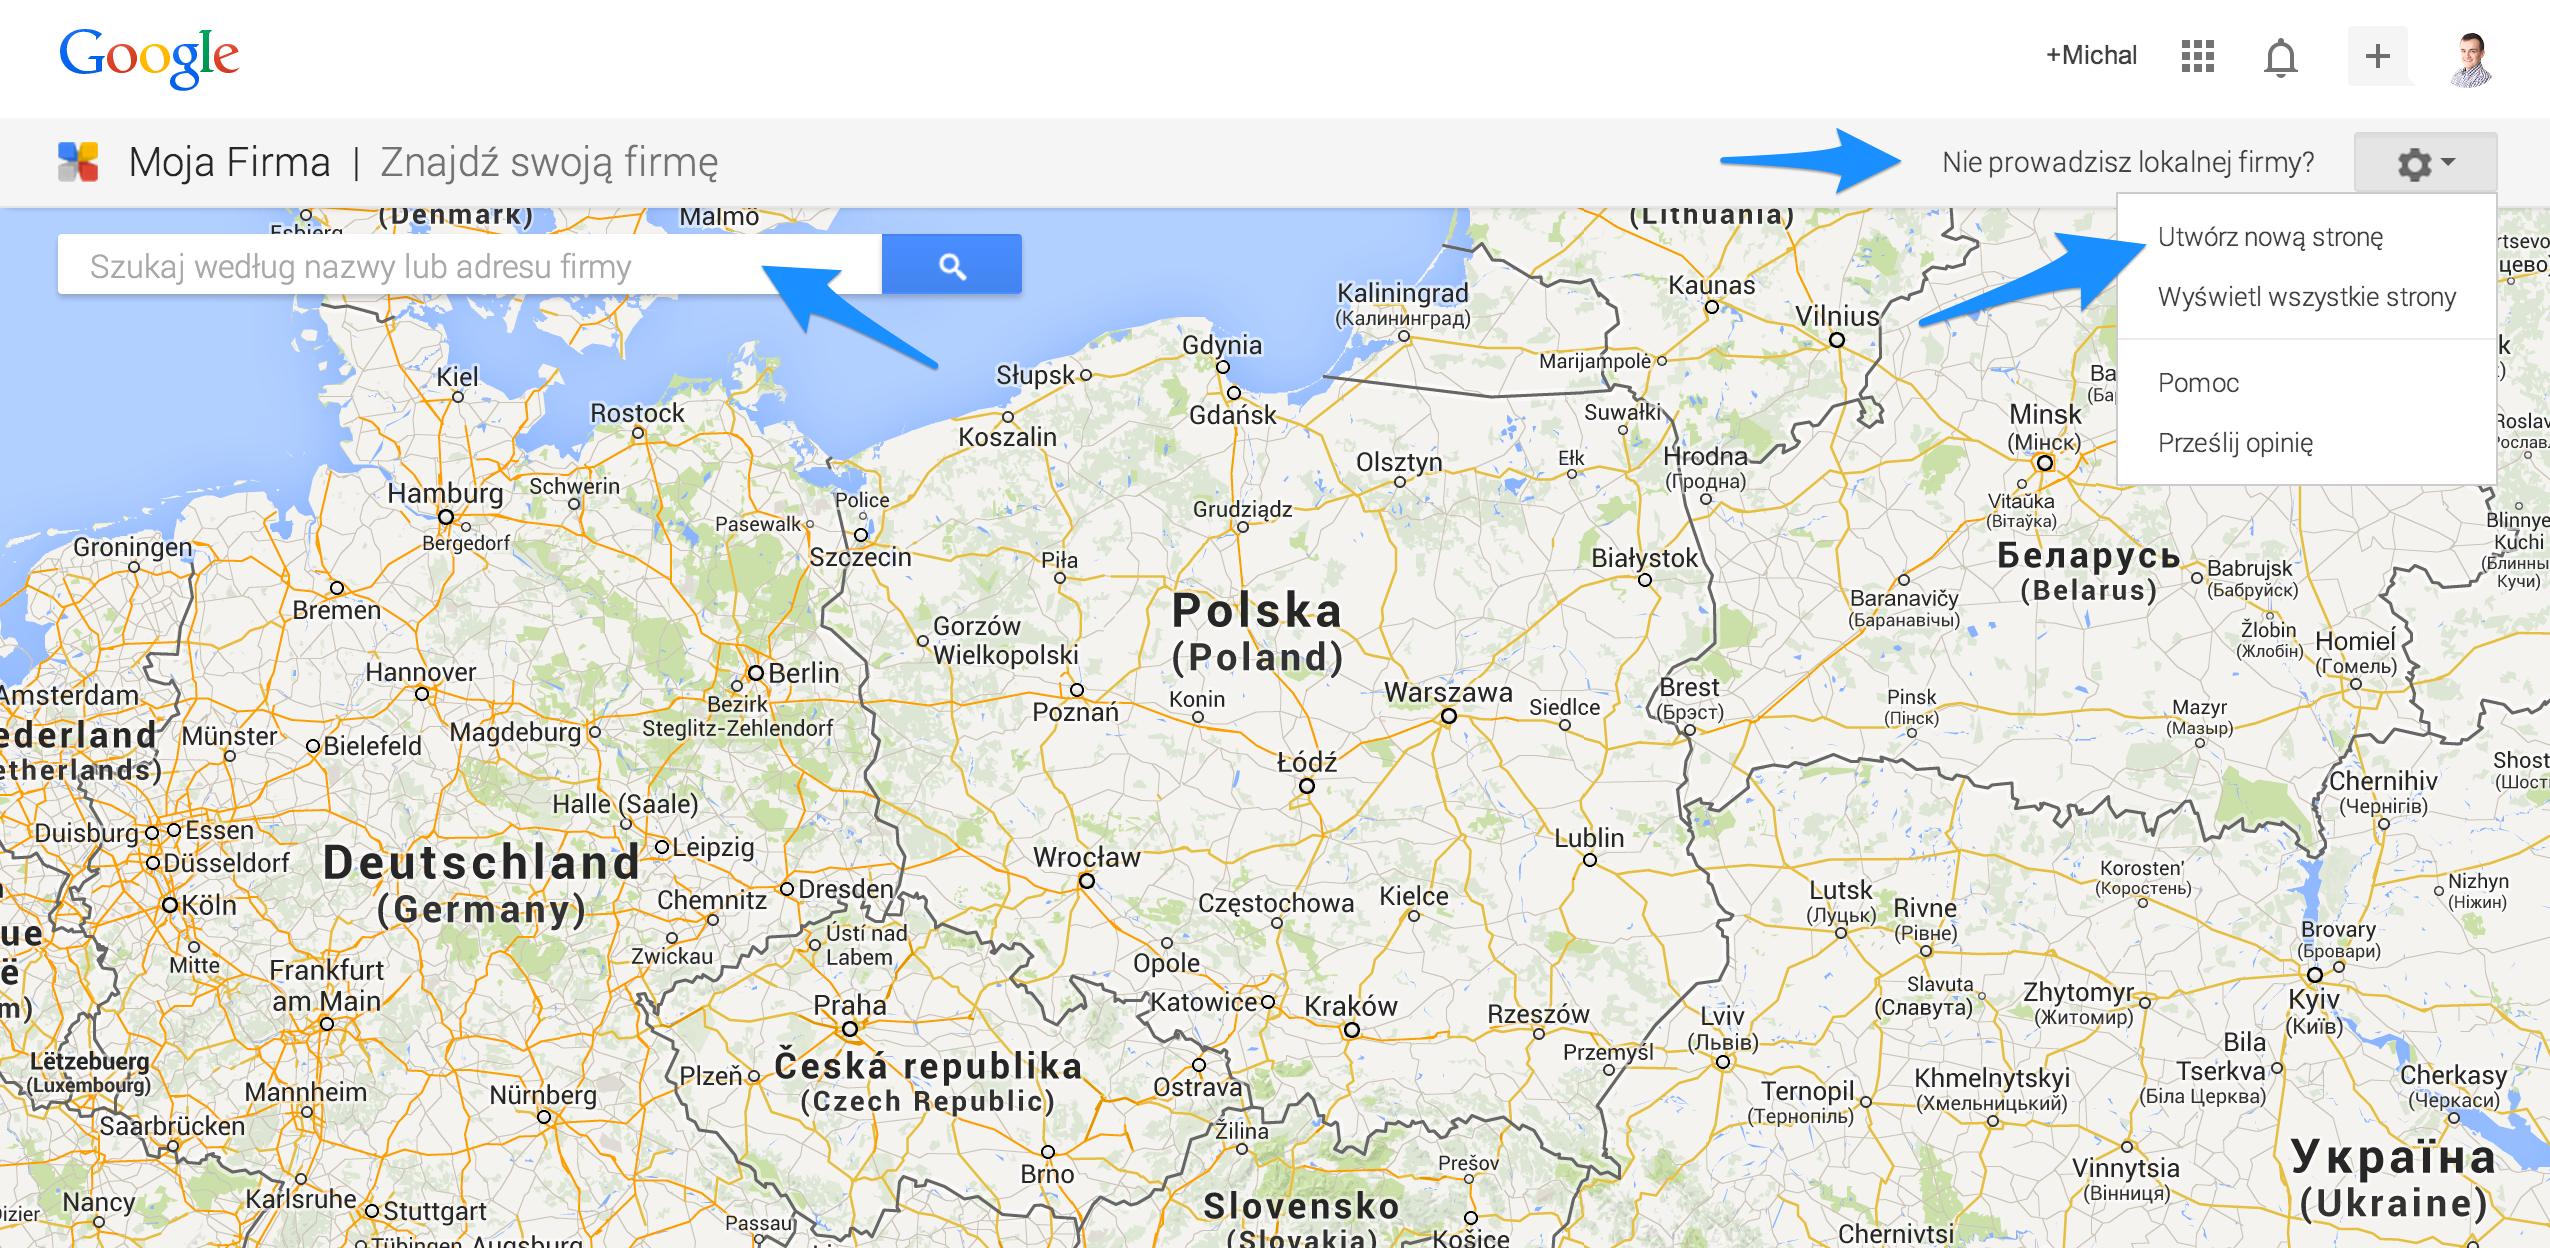 Google Moja Firma Mapa